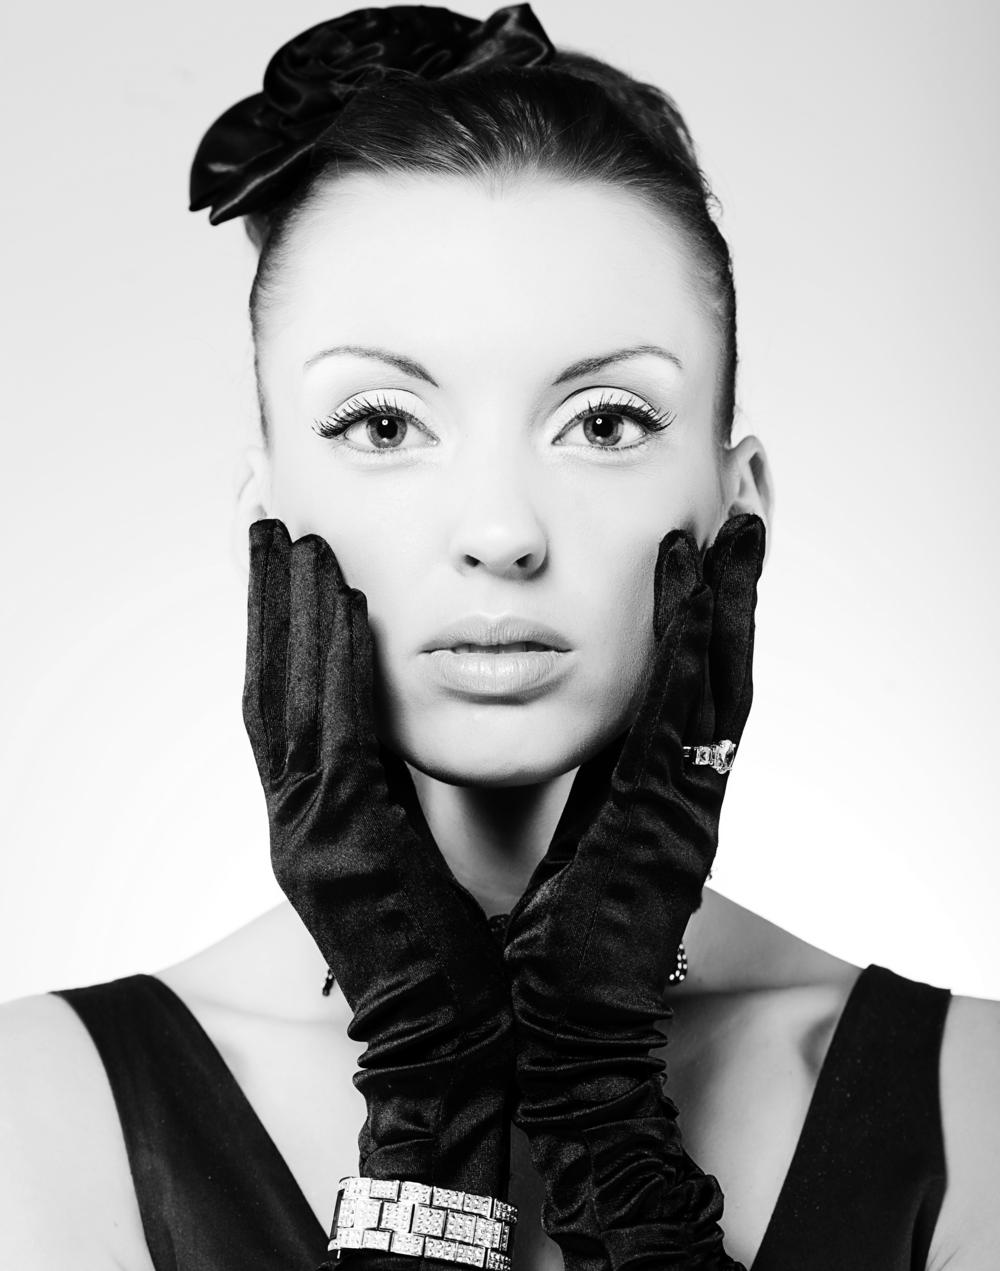 bigstock-Vogue-style-vintage-portrait-35629610.jpg